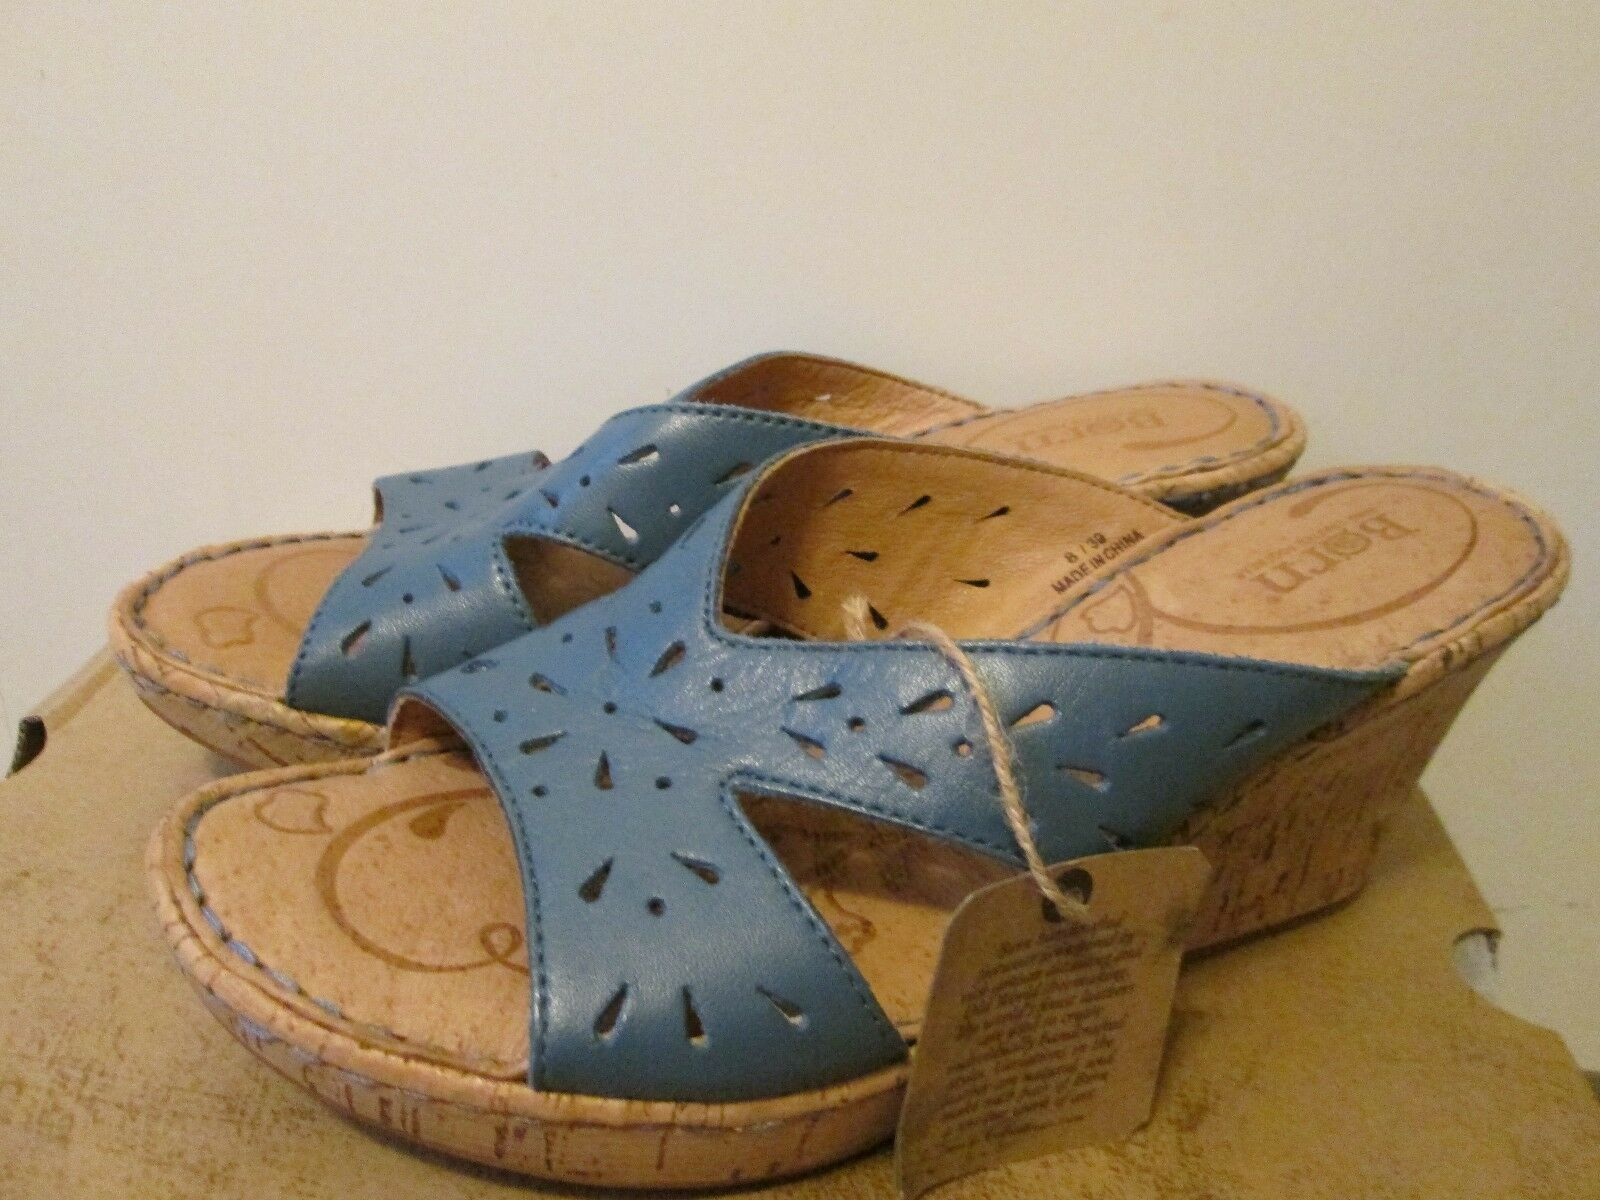 120 BORN Canova Blau Leather High Sz Heel Wedge Platform Sandal Slide Sz High 8 NEW a0f350